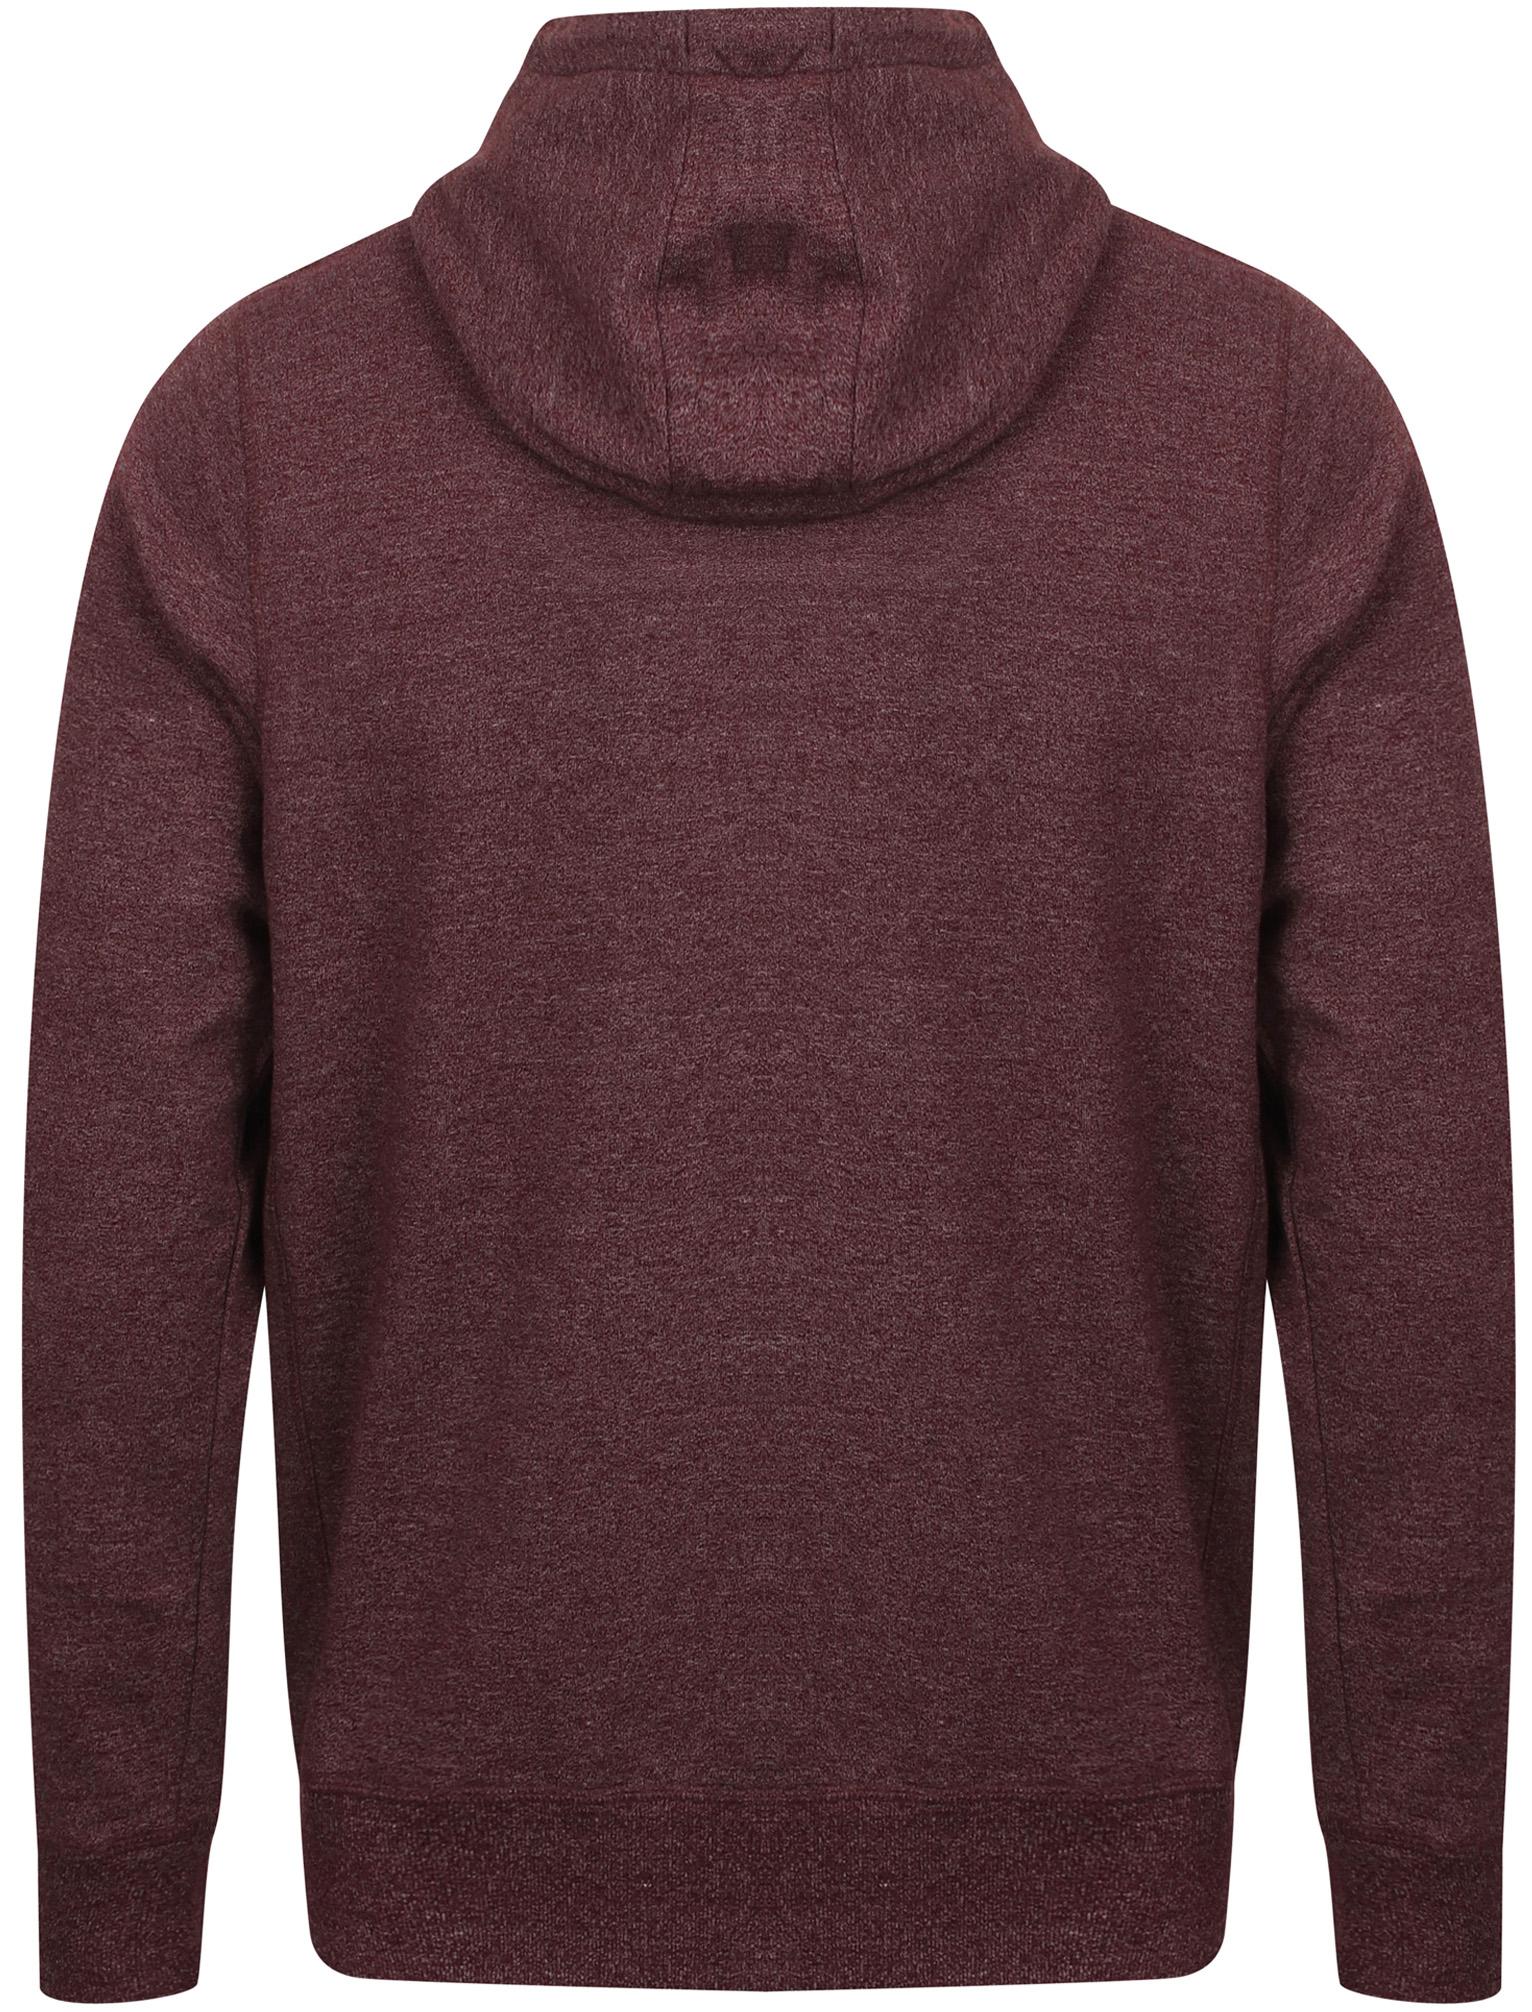 Tokyo-Laundry-Men-039-s-Hampton-Zip-Through-Hoodie-Hooded-Top thumbnail 7